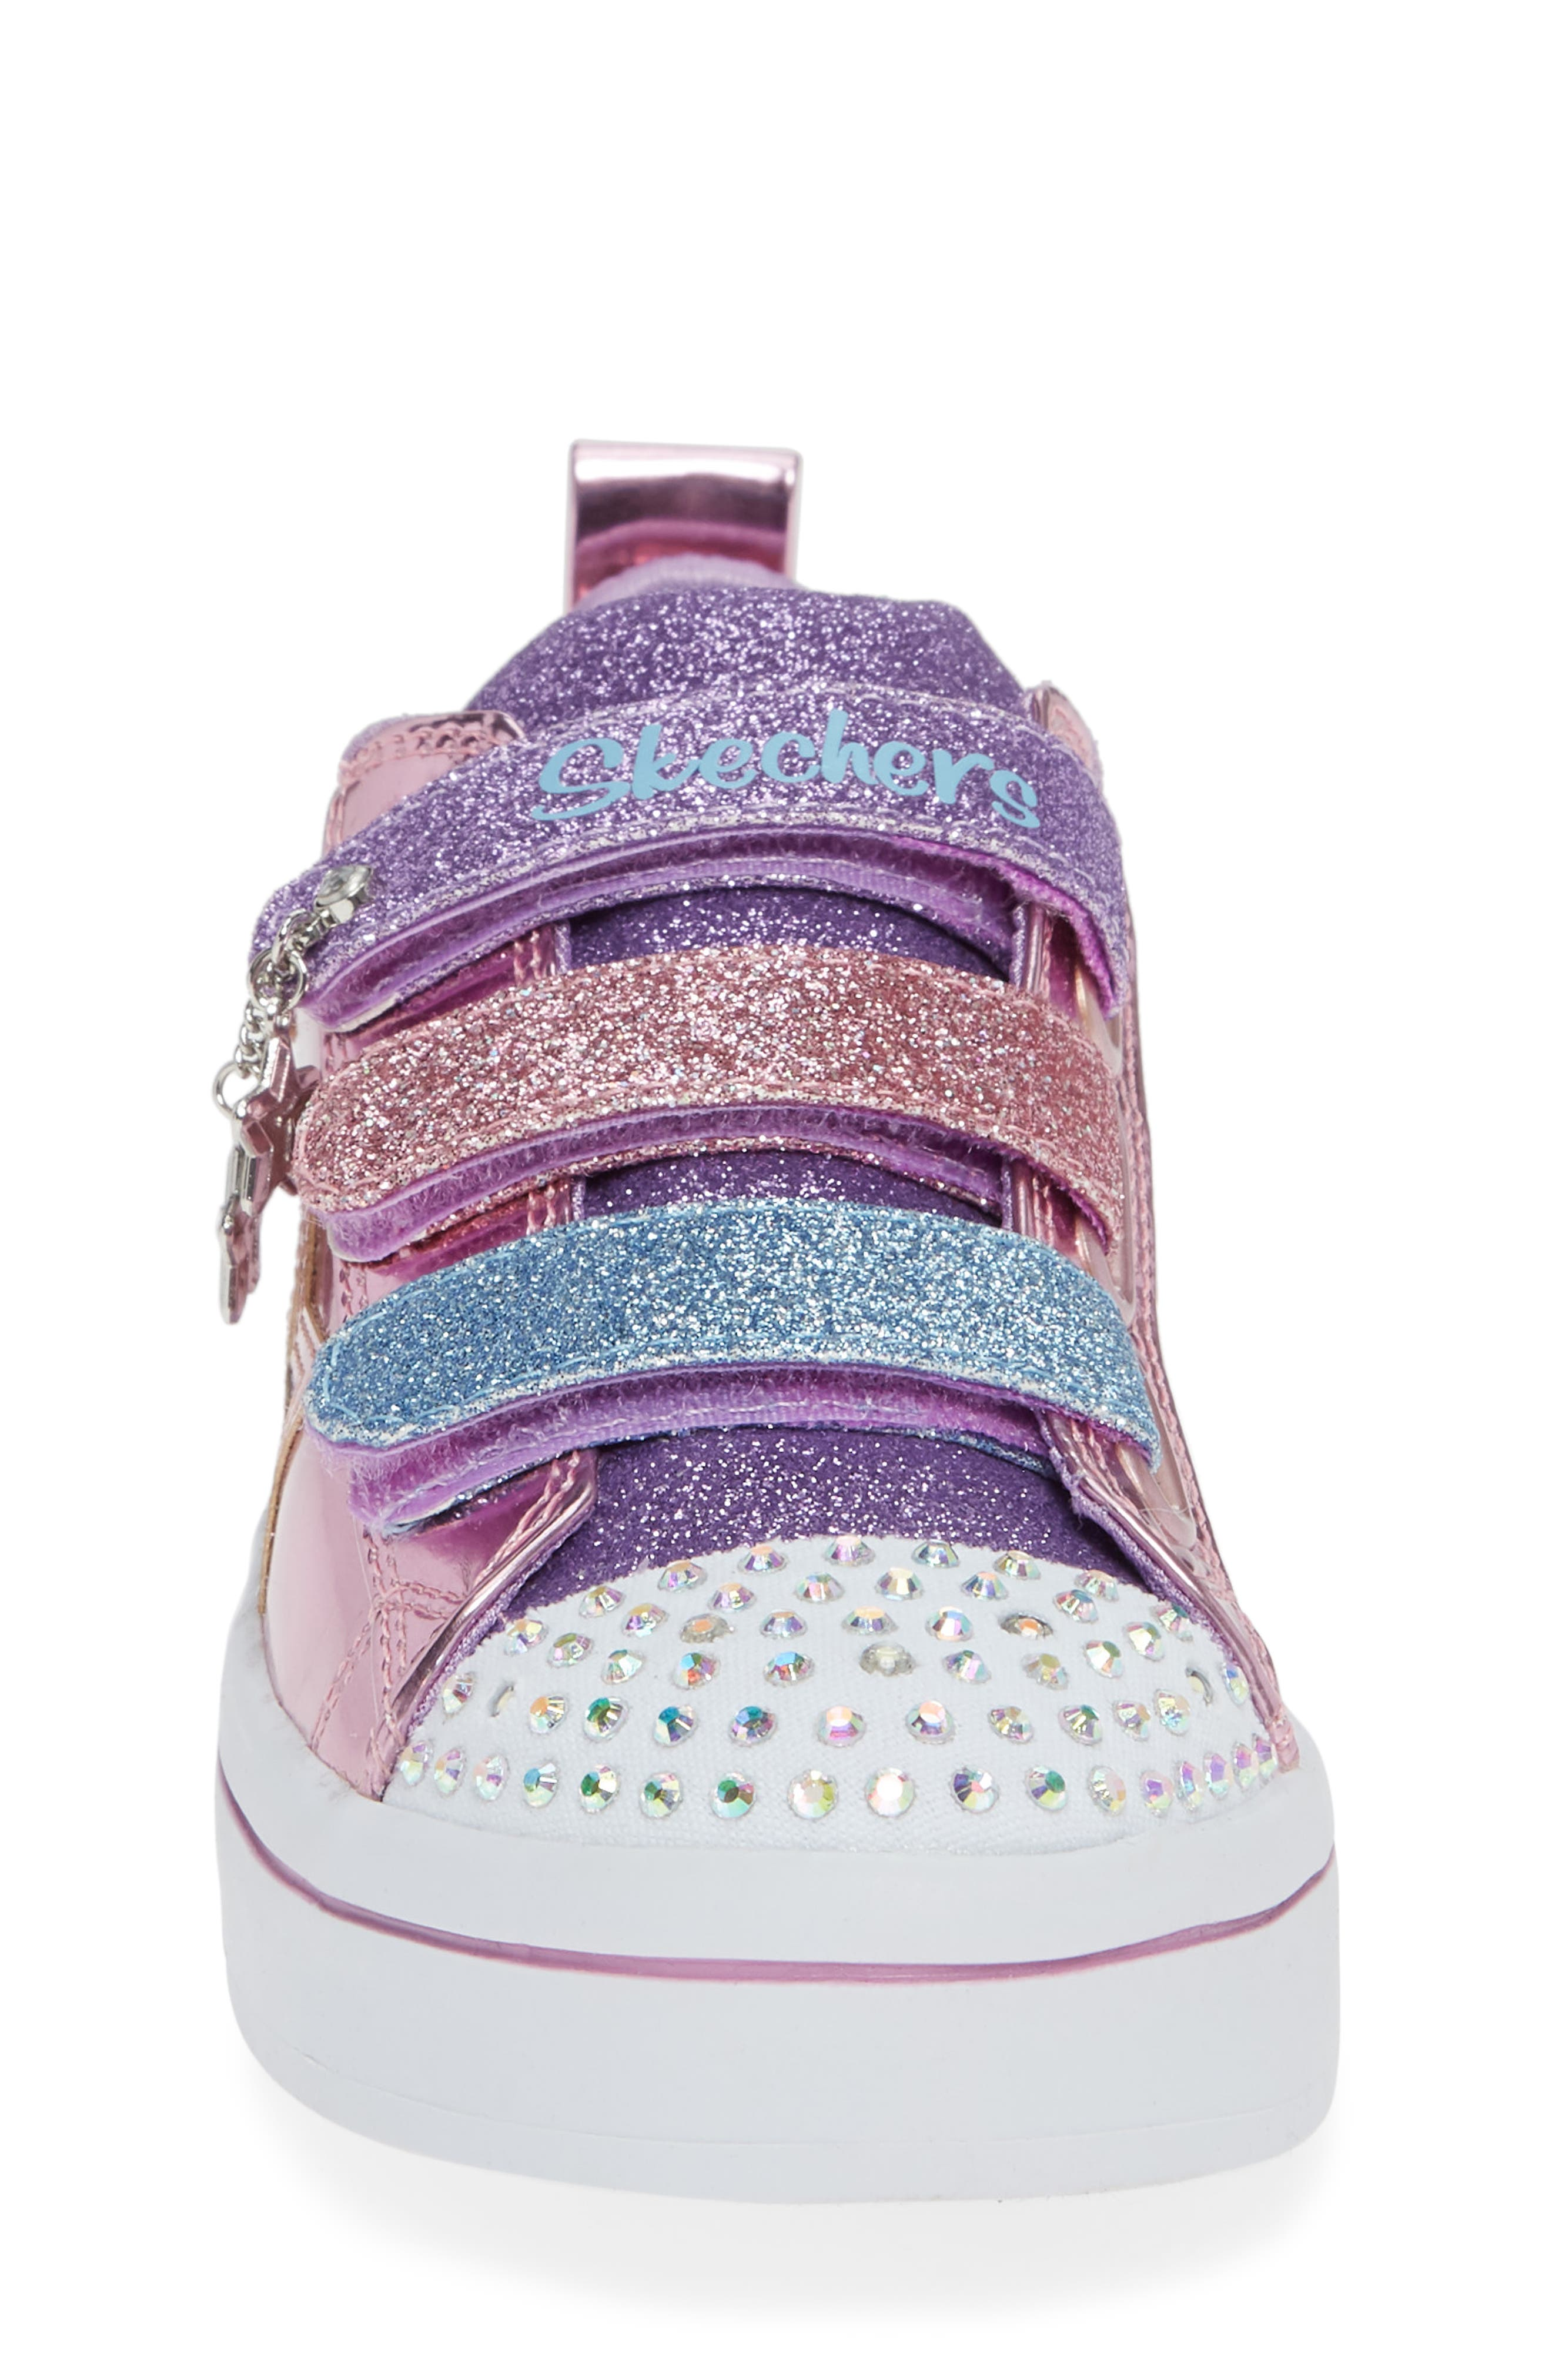 Twi-Lites Star Light-Up Sneaker,                             Alternate thumbnail 4, color,                             PINK/ MULTI